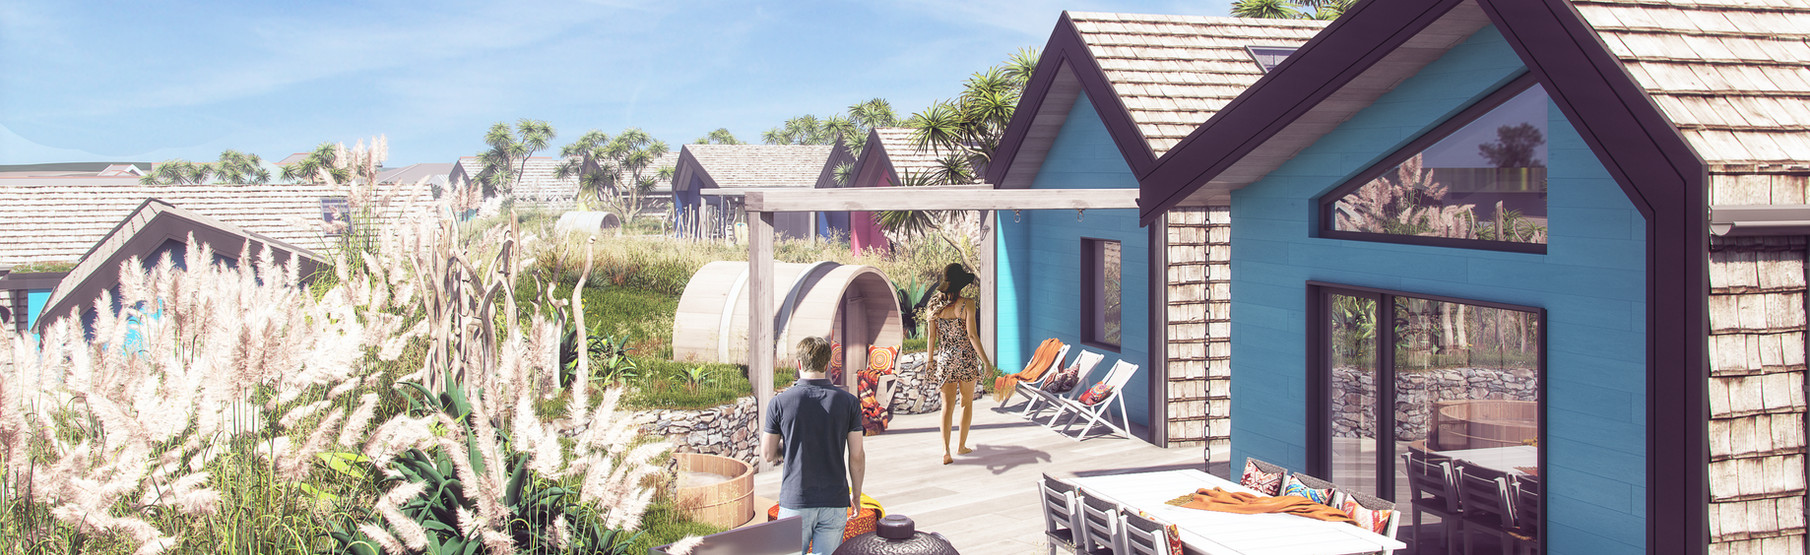 house.type.all.exterior.decking.artist-i